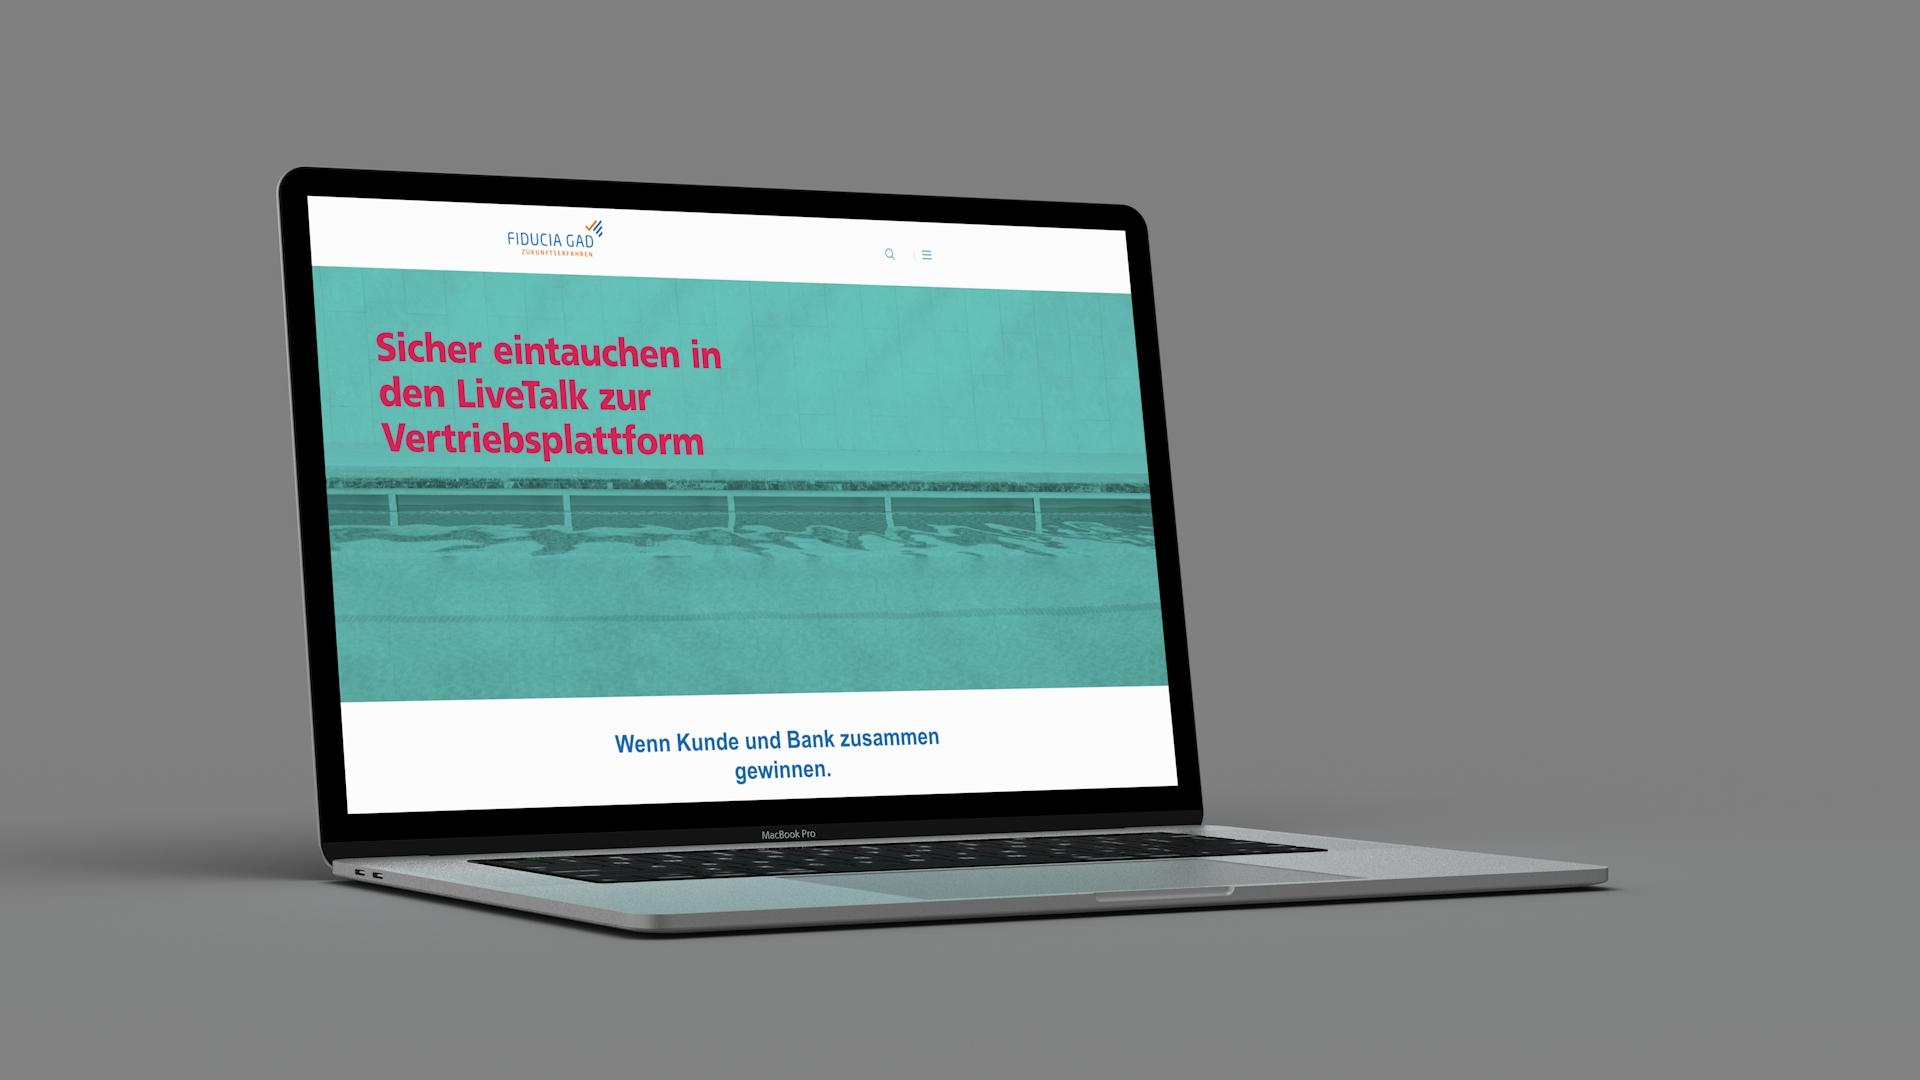 FIDU_Digitale_Vertriebsplattform_00